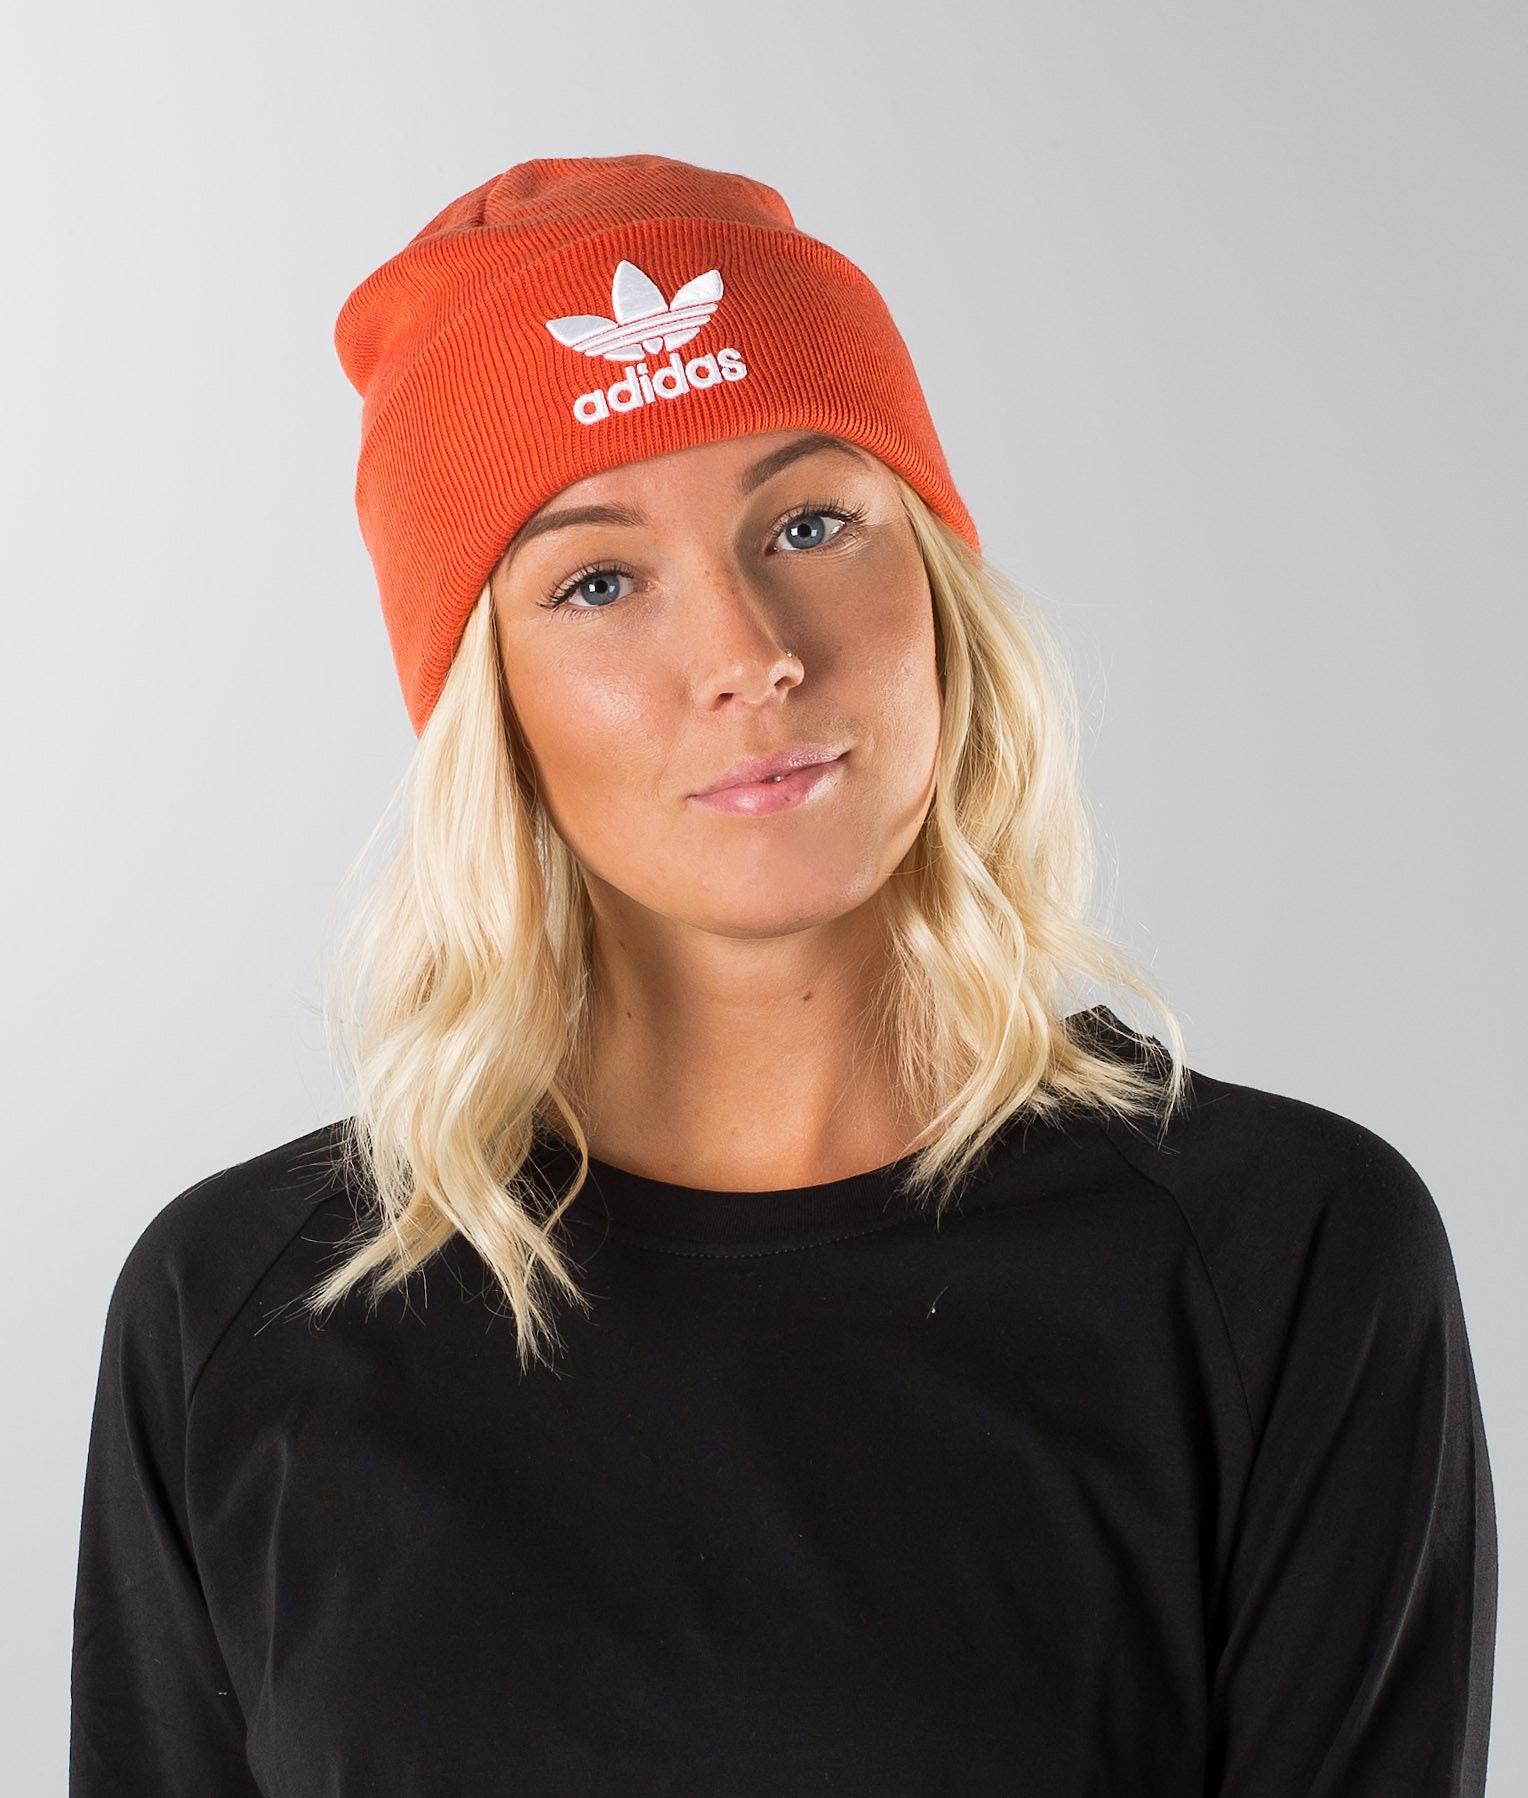 b2ff7b033c362 Adidas Originals Trefoil Beanie Raw Amber